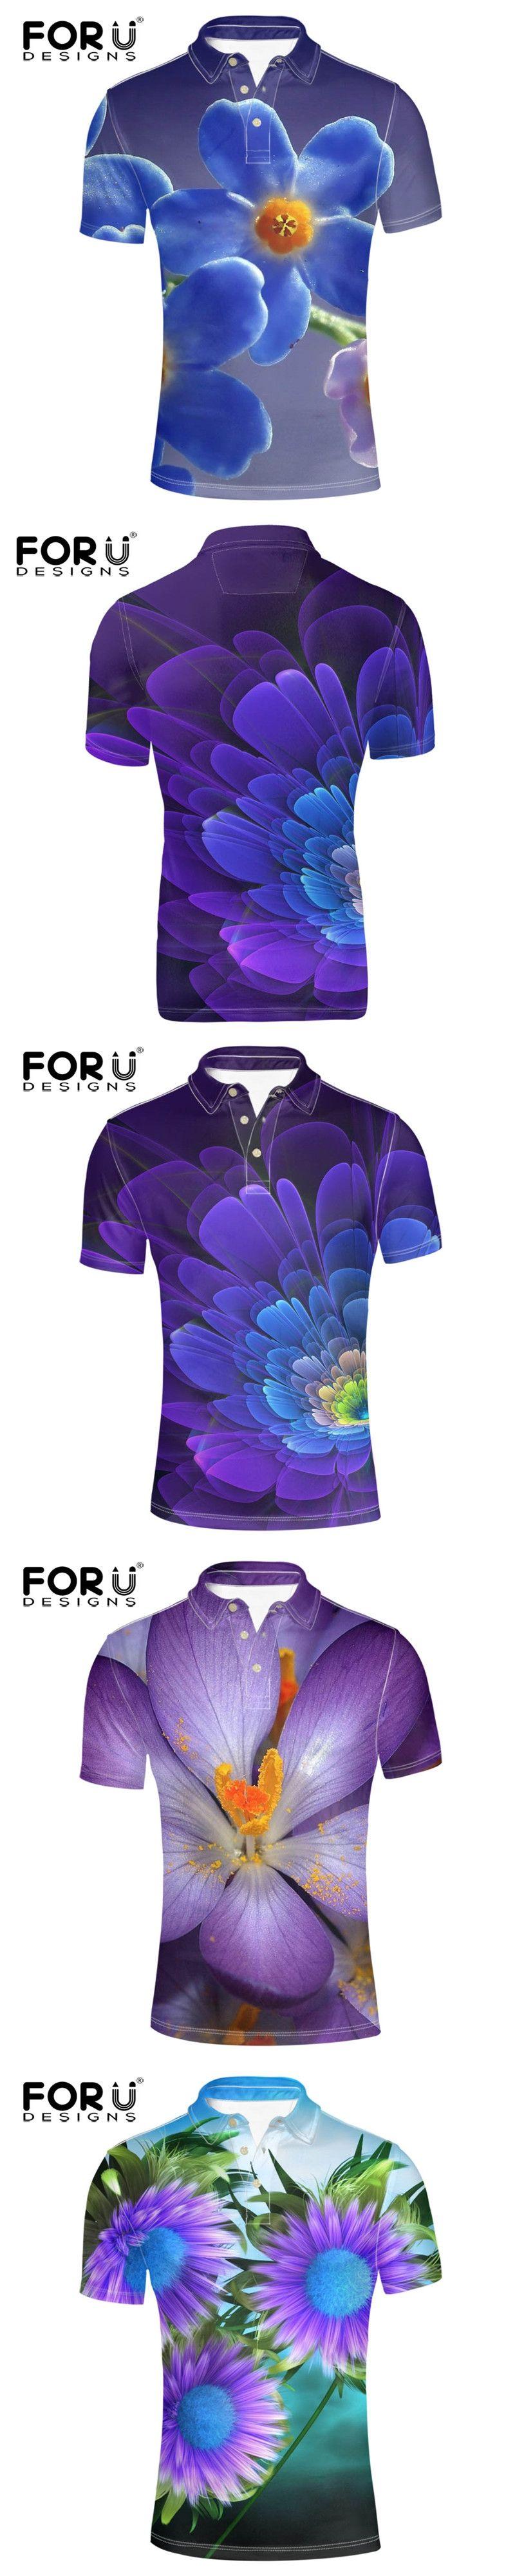 FORUDESIGNS Stylish 3D Unique Flower Print Mens Polo Shirt Summer Elastic  Polos for Male Brand Designer fb3472210e25b